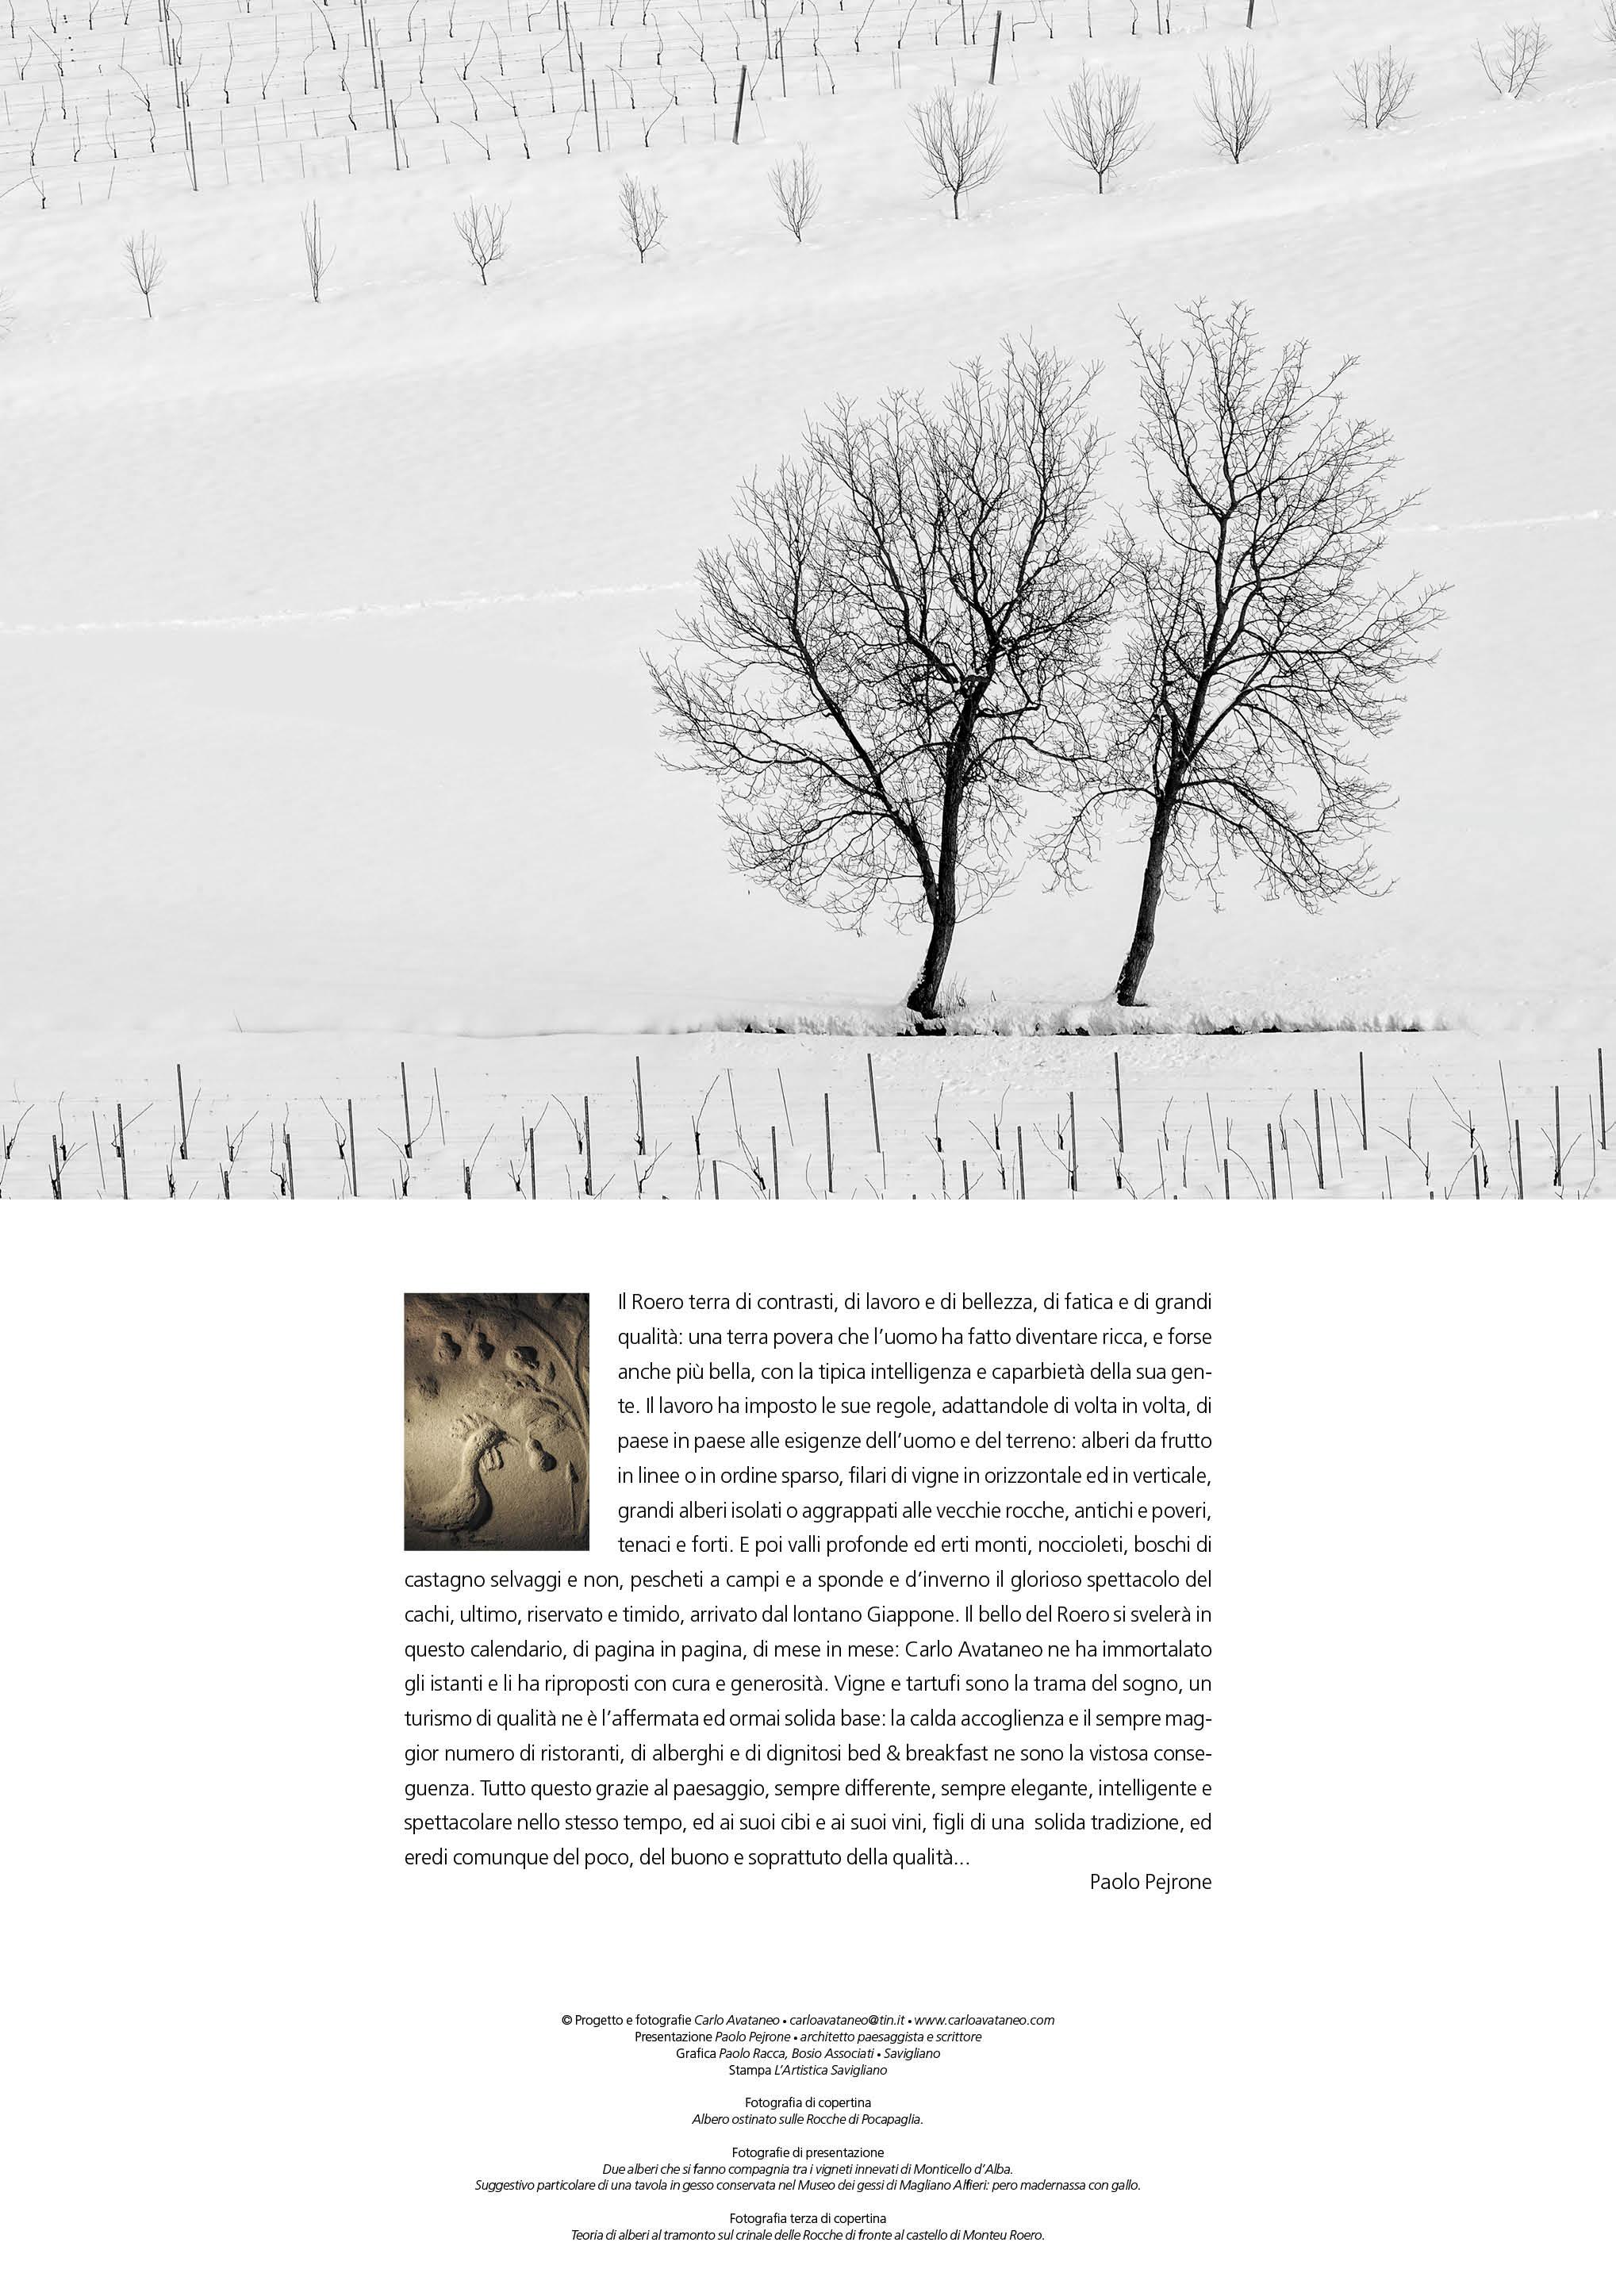 alberi del roero_cop 2016_b22.jpg